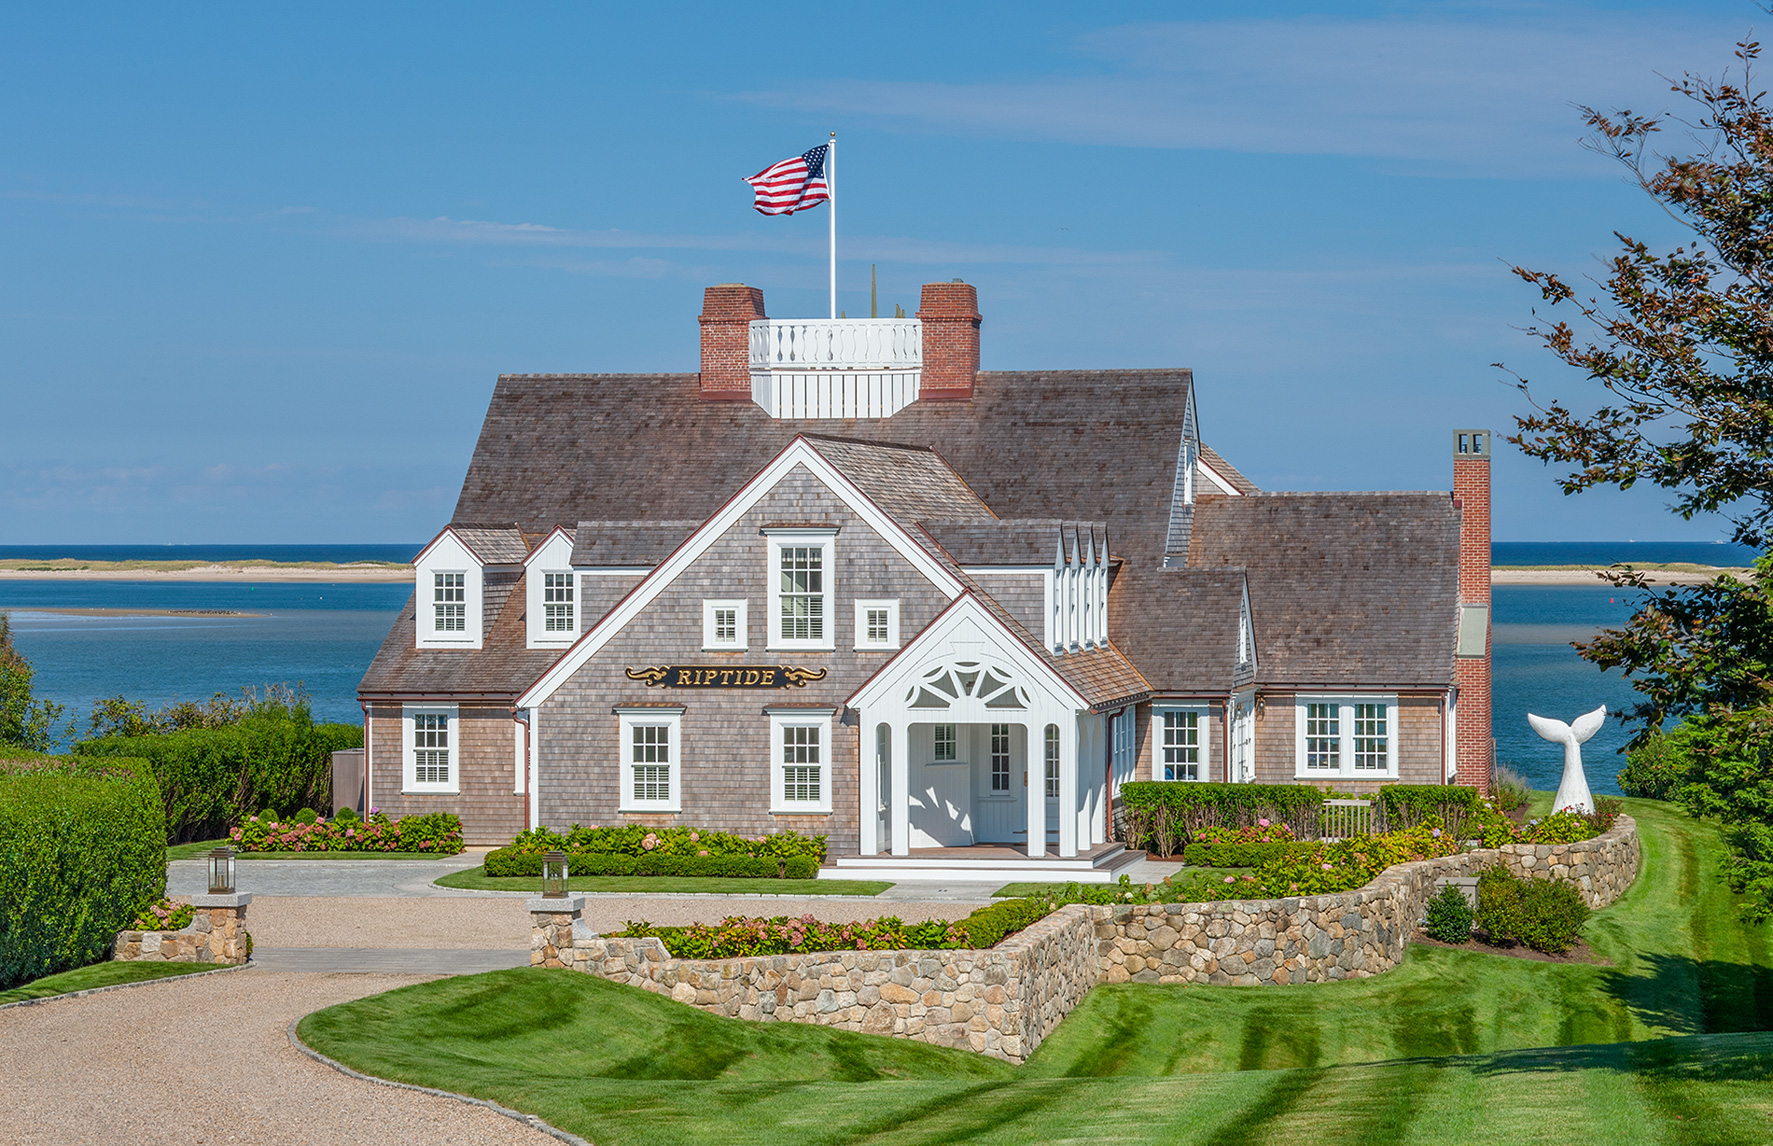 Custom Cape Cod home renovation by Polhemus Savery DaSilva Architects Builders